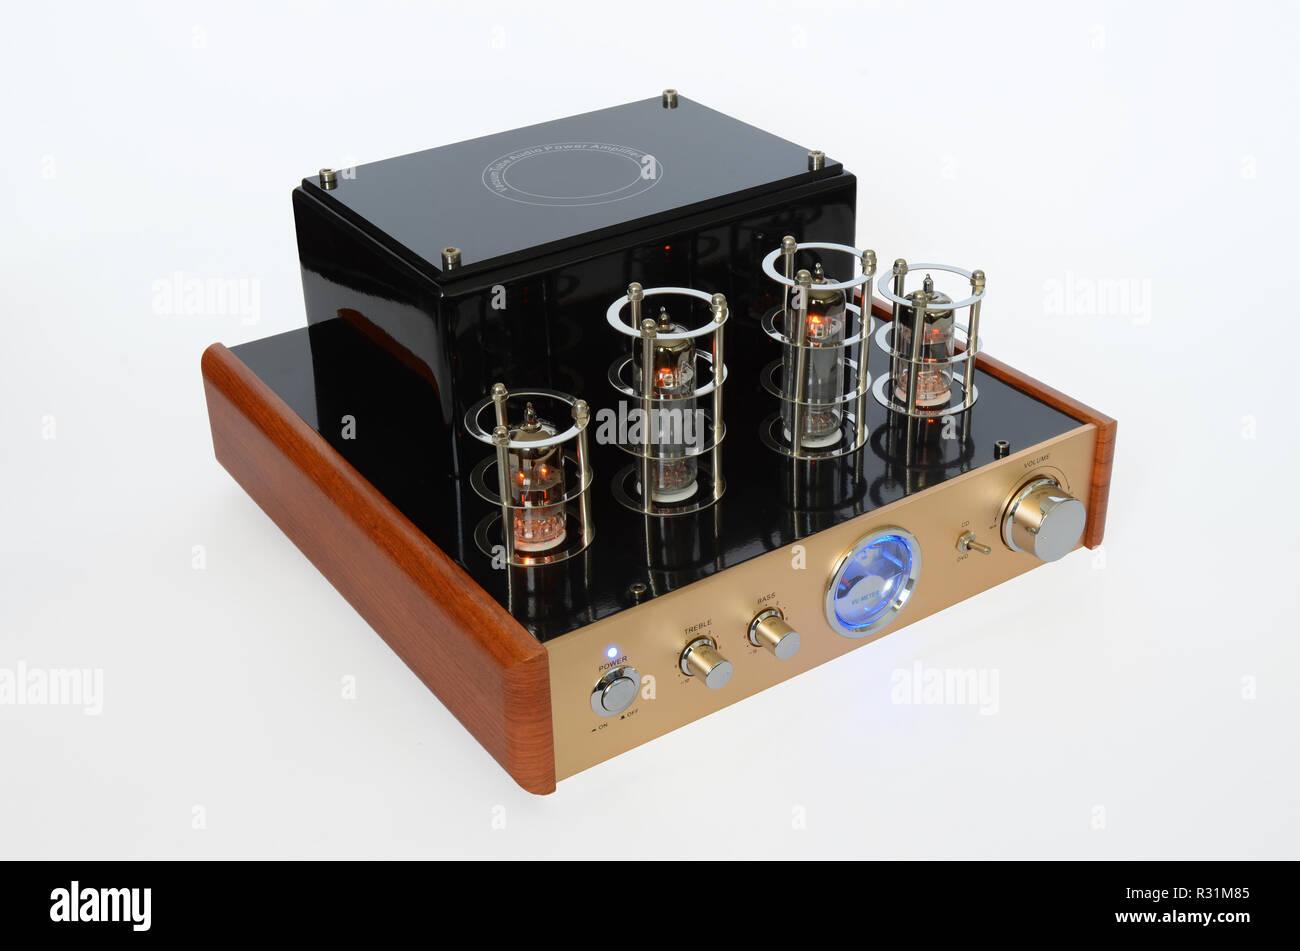 Valve Amplifier Stock Photos & Valve Amplifier Stock Images